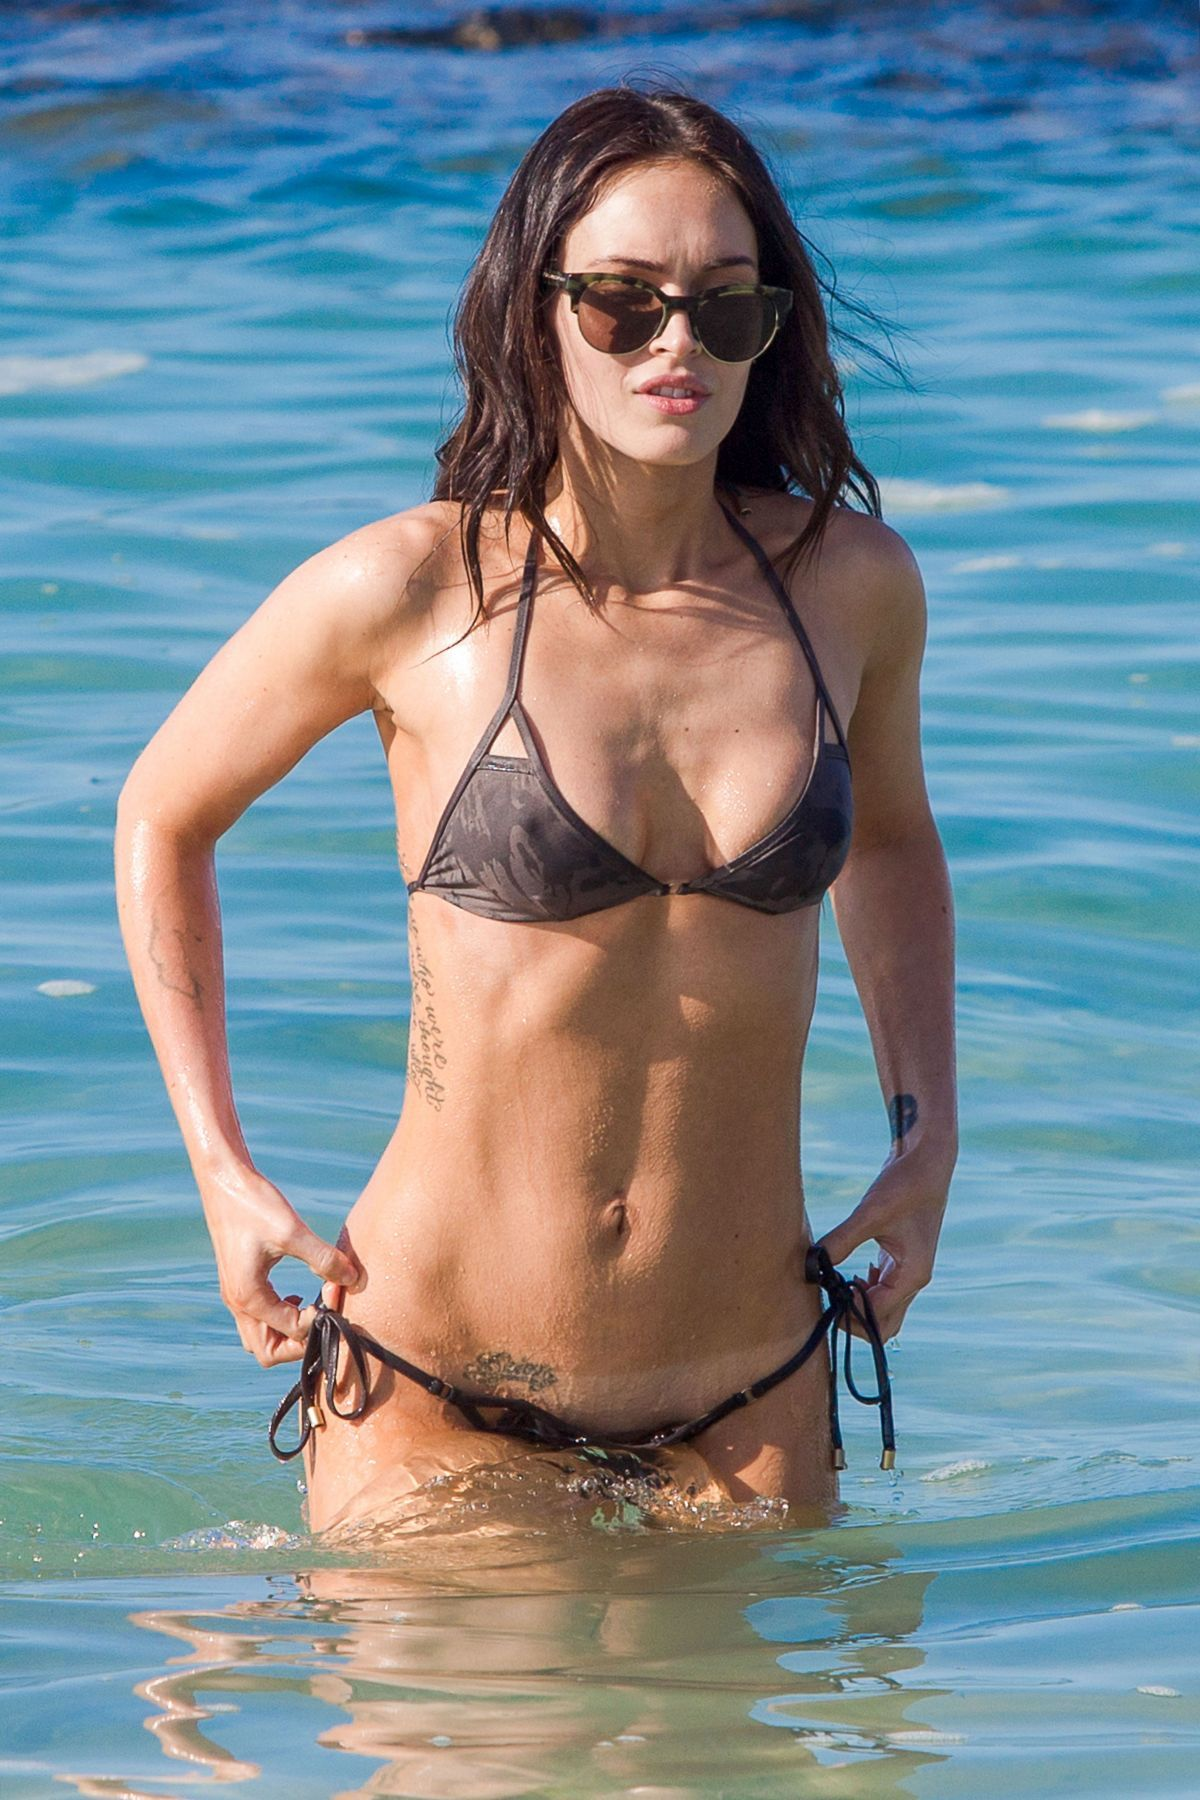 Megan fox on the beach in hawaii dec nude (56 photos), Twitter Celebrites foto